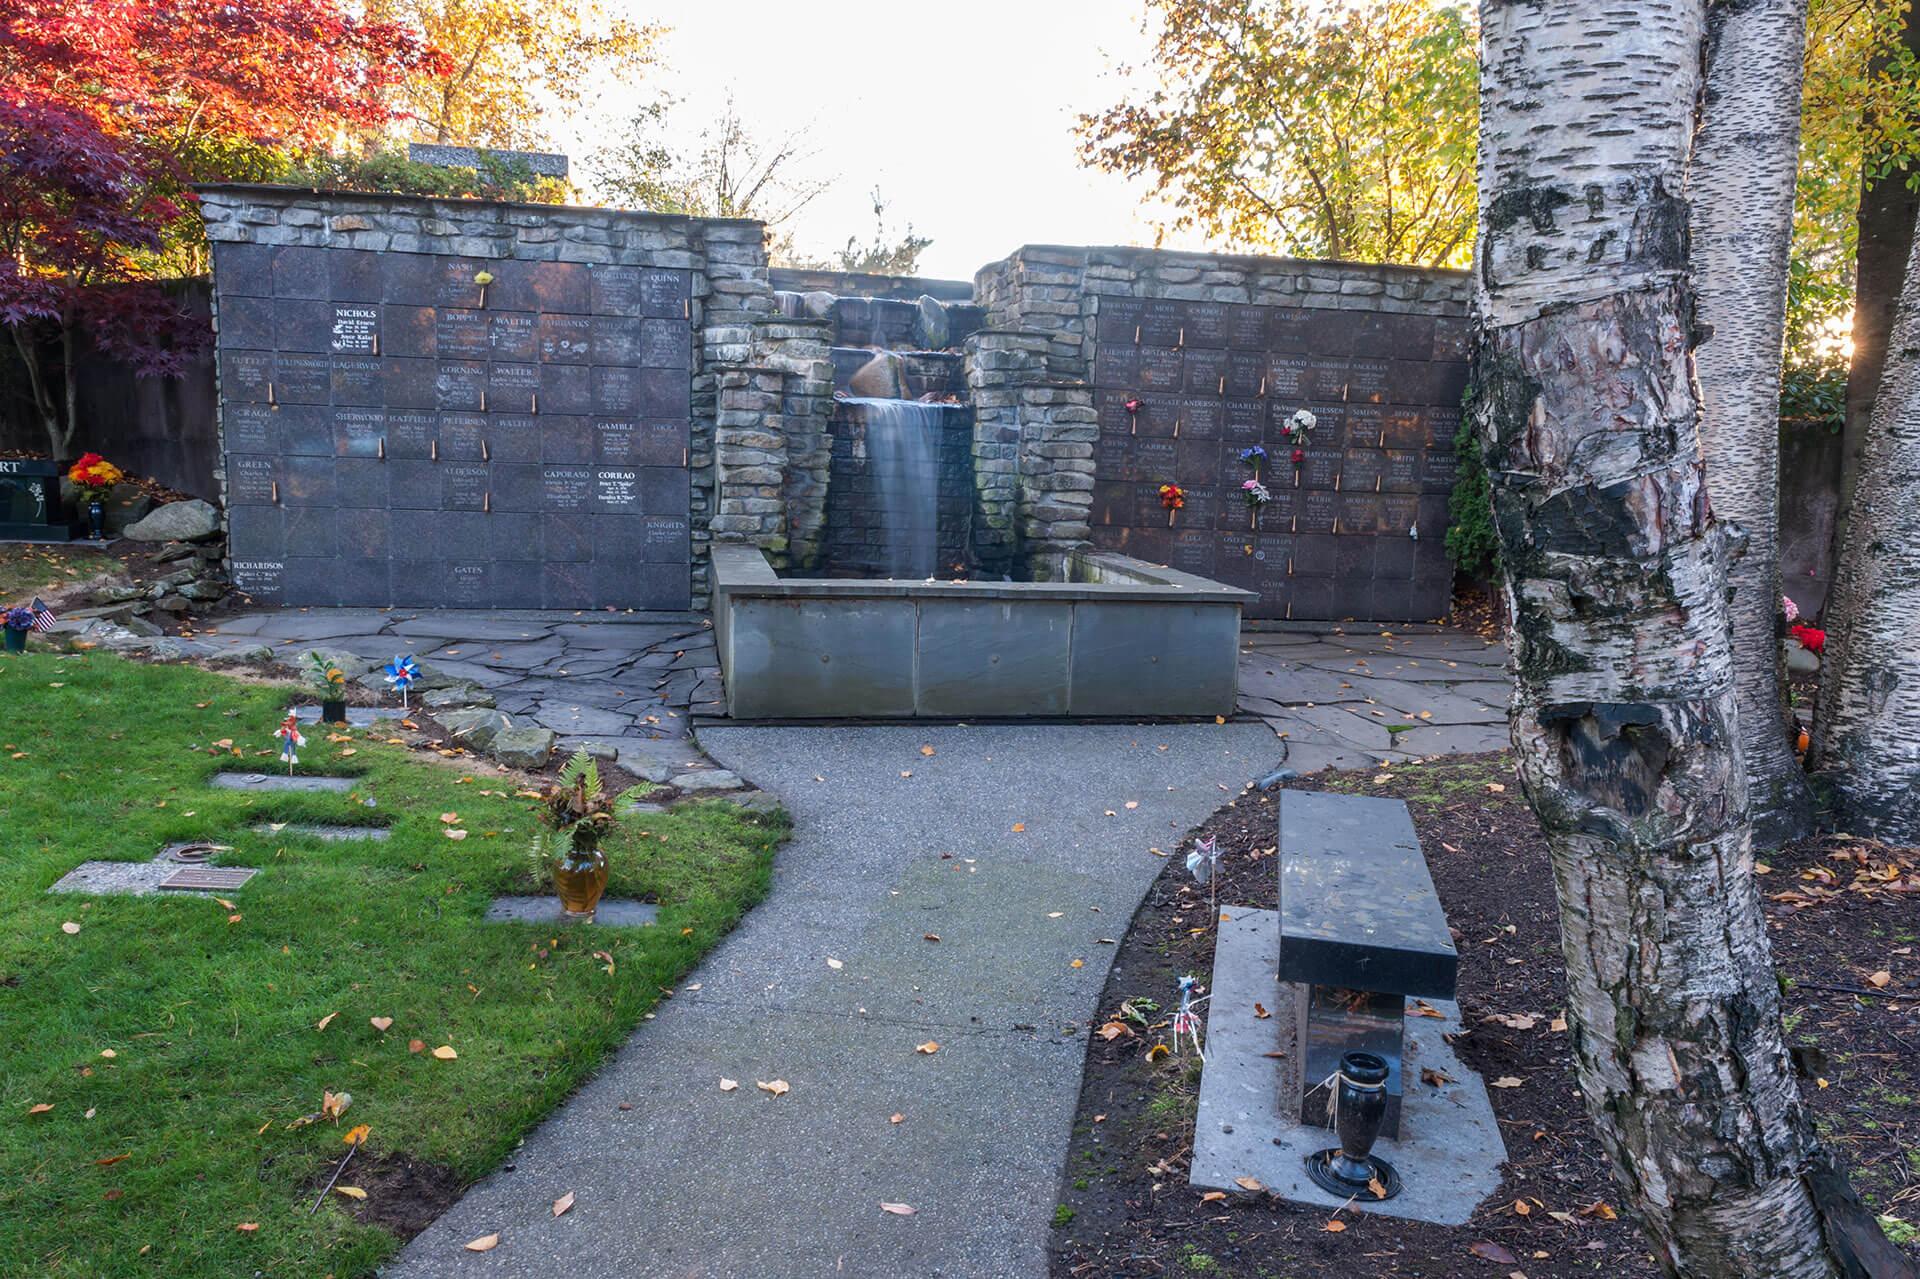 greenacres gallery 4 Waterfall columburium and cenotaph